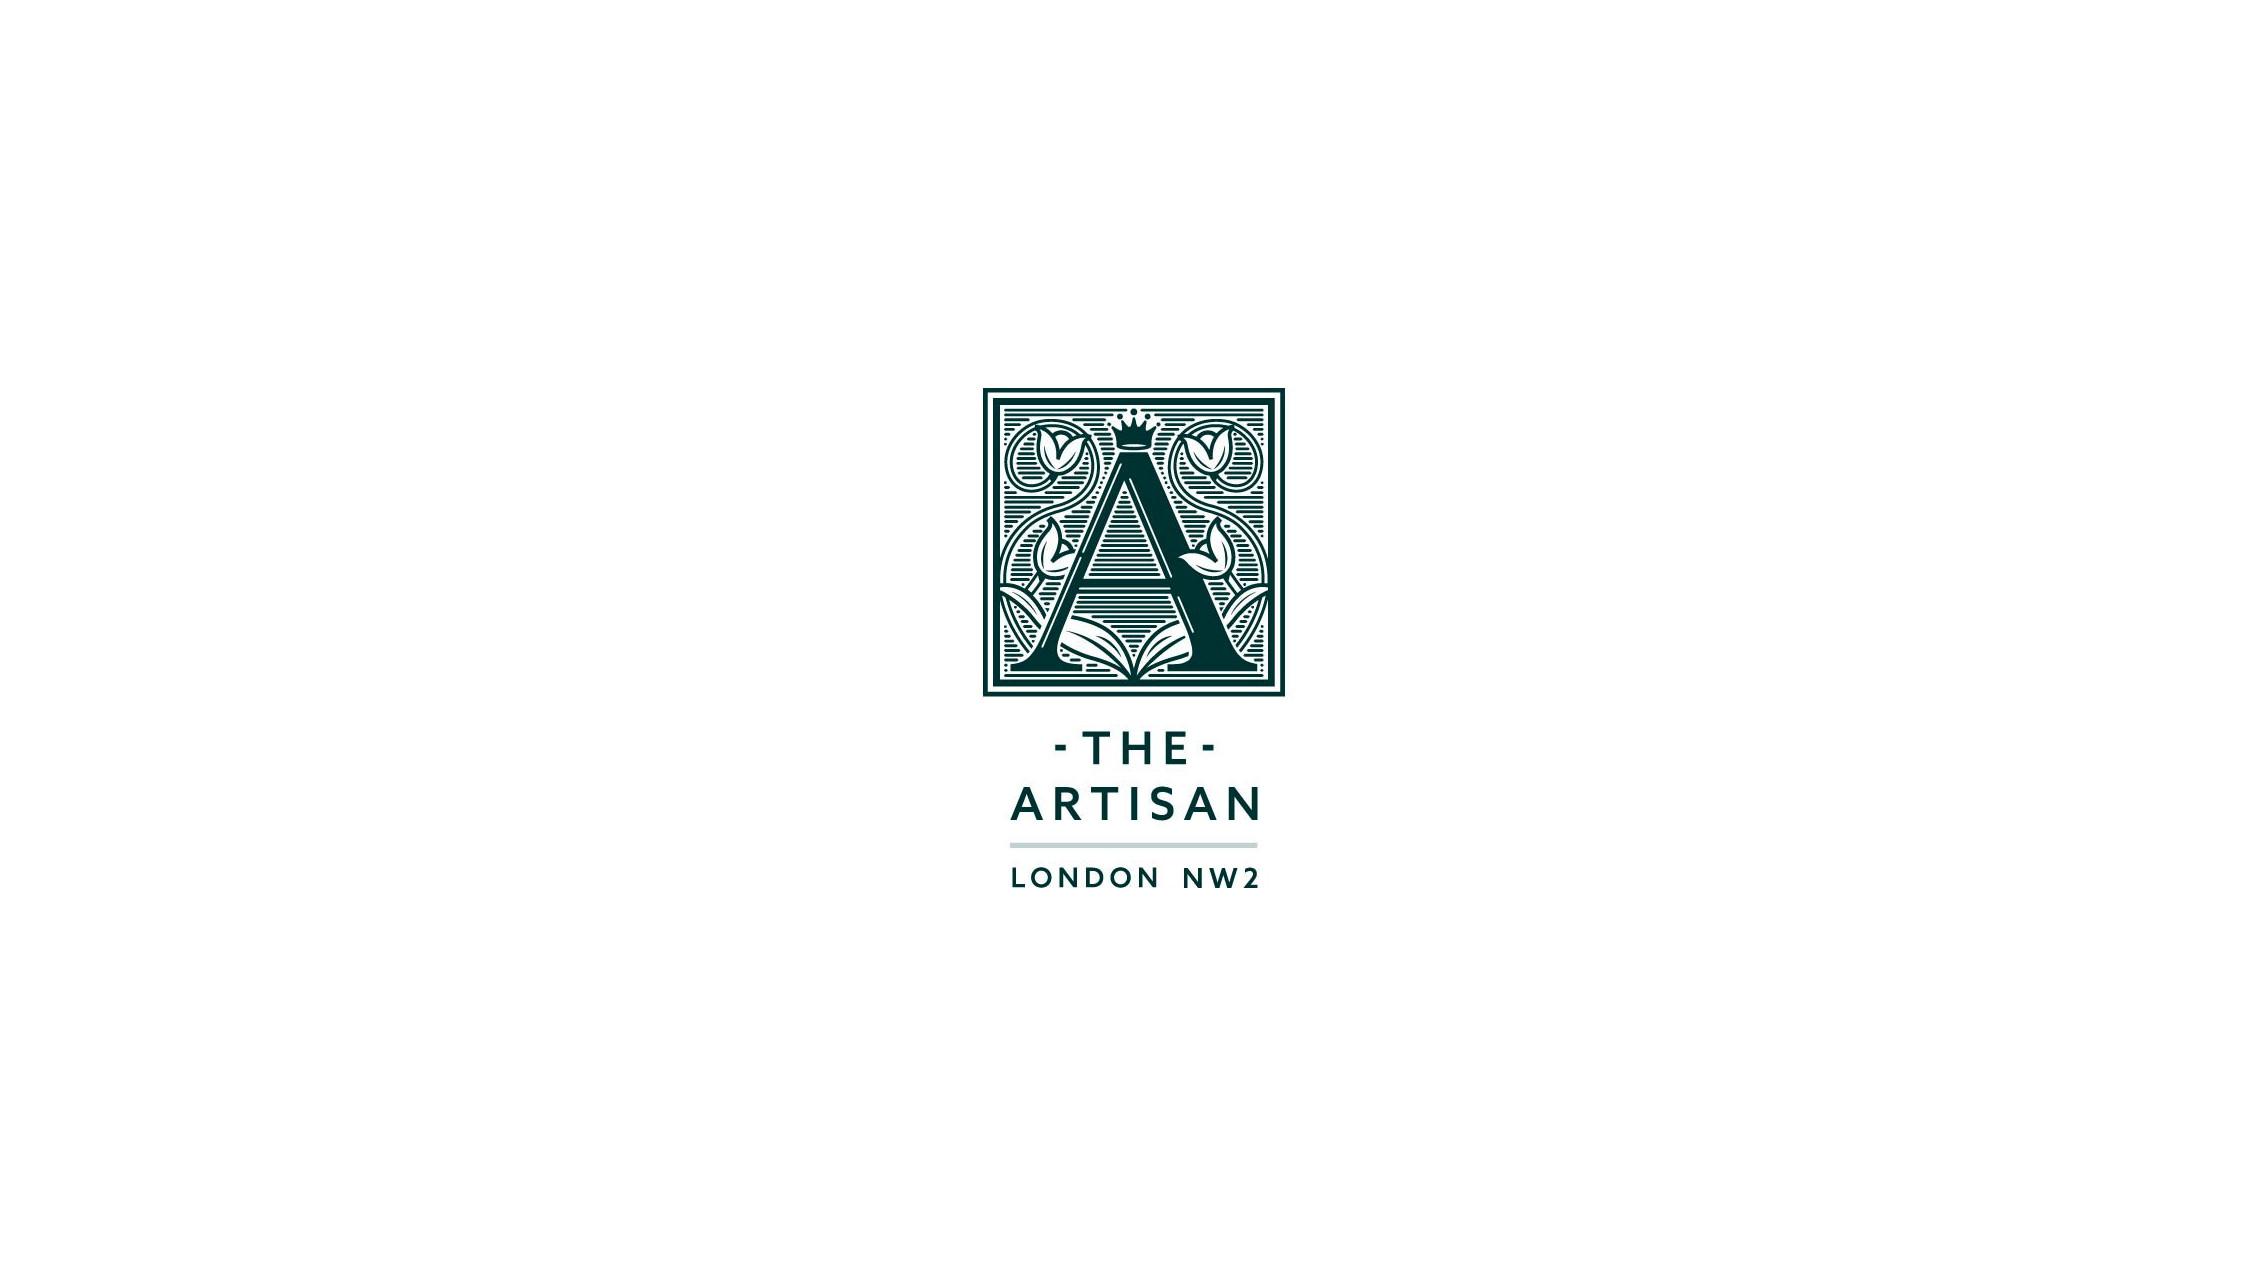 The Artisan development logo.